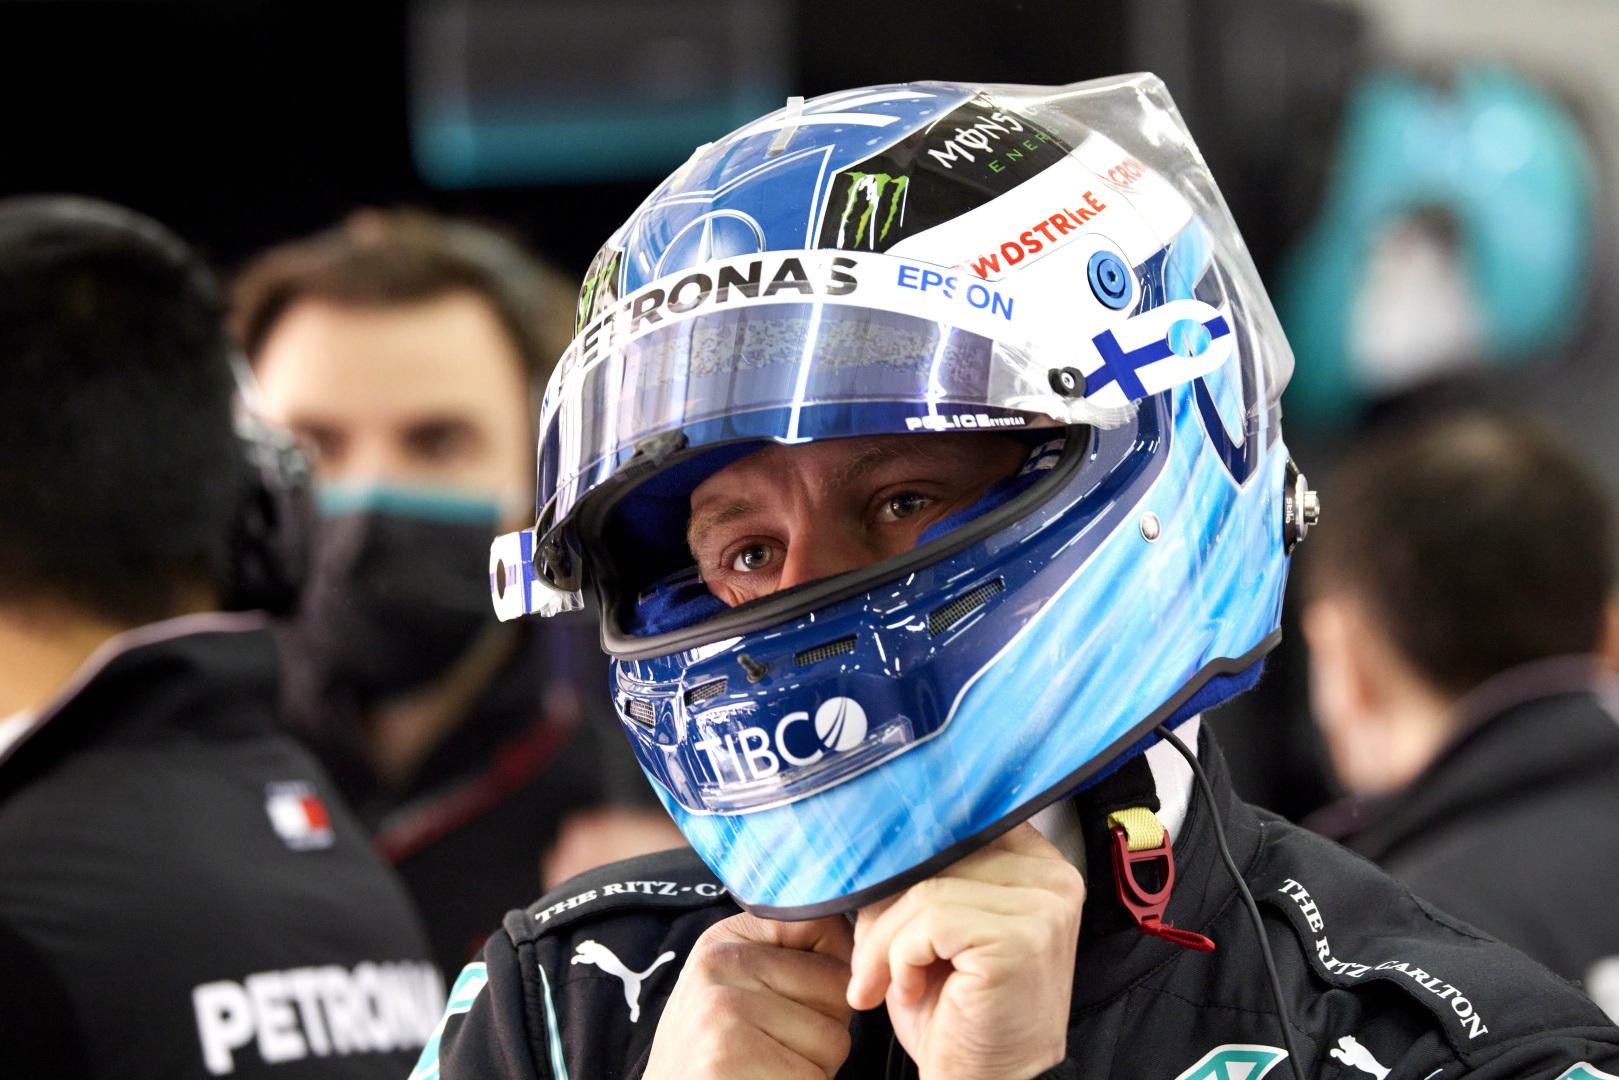 Bottas should 'ask himself' why he was battling a Williams - F1i.com